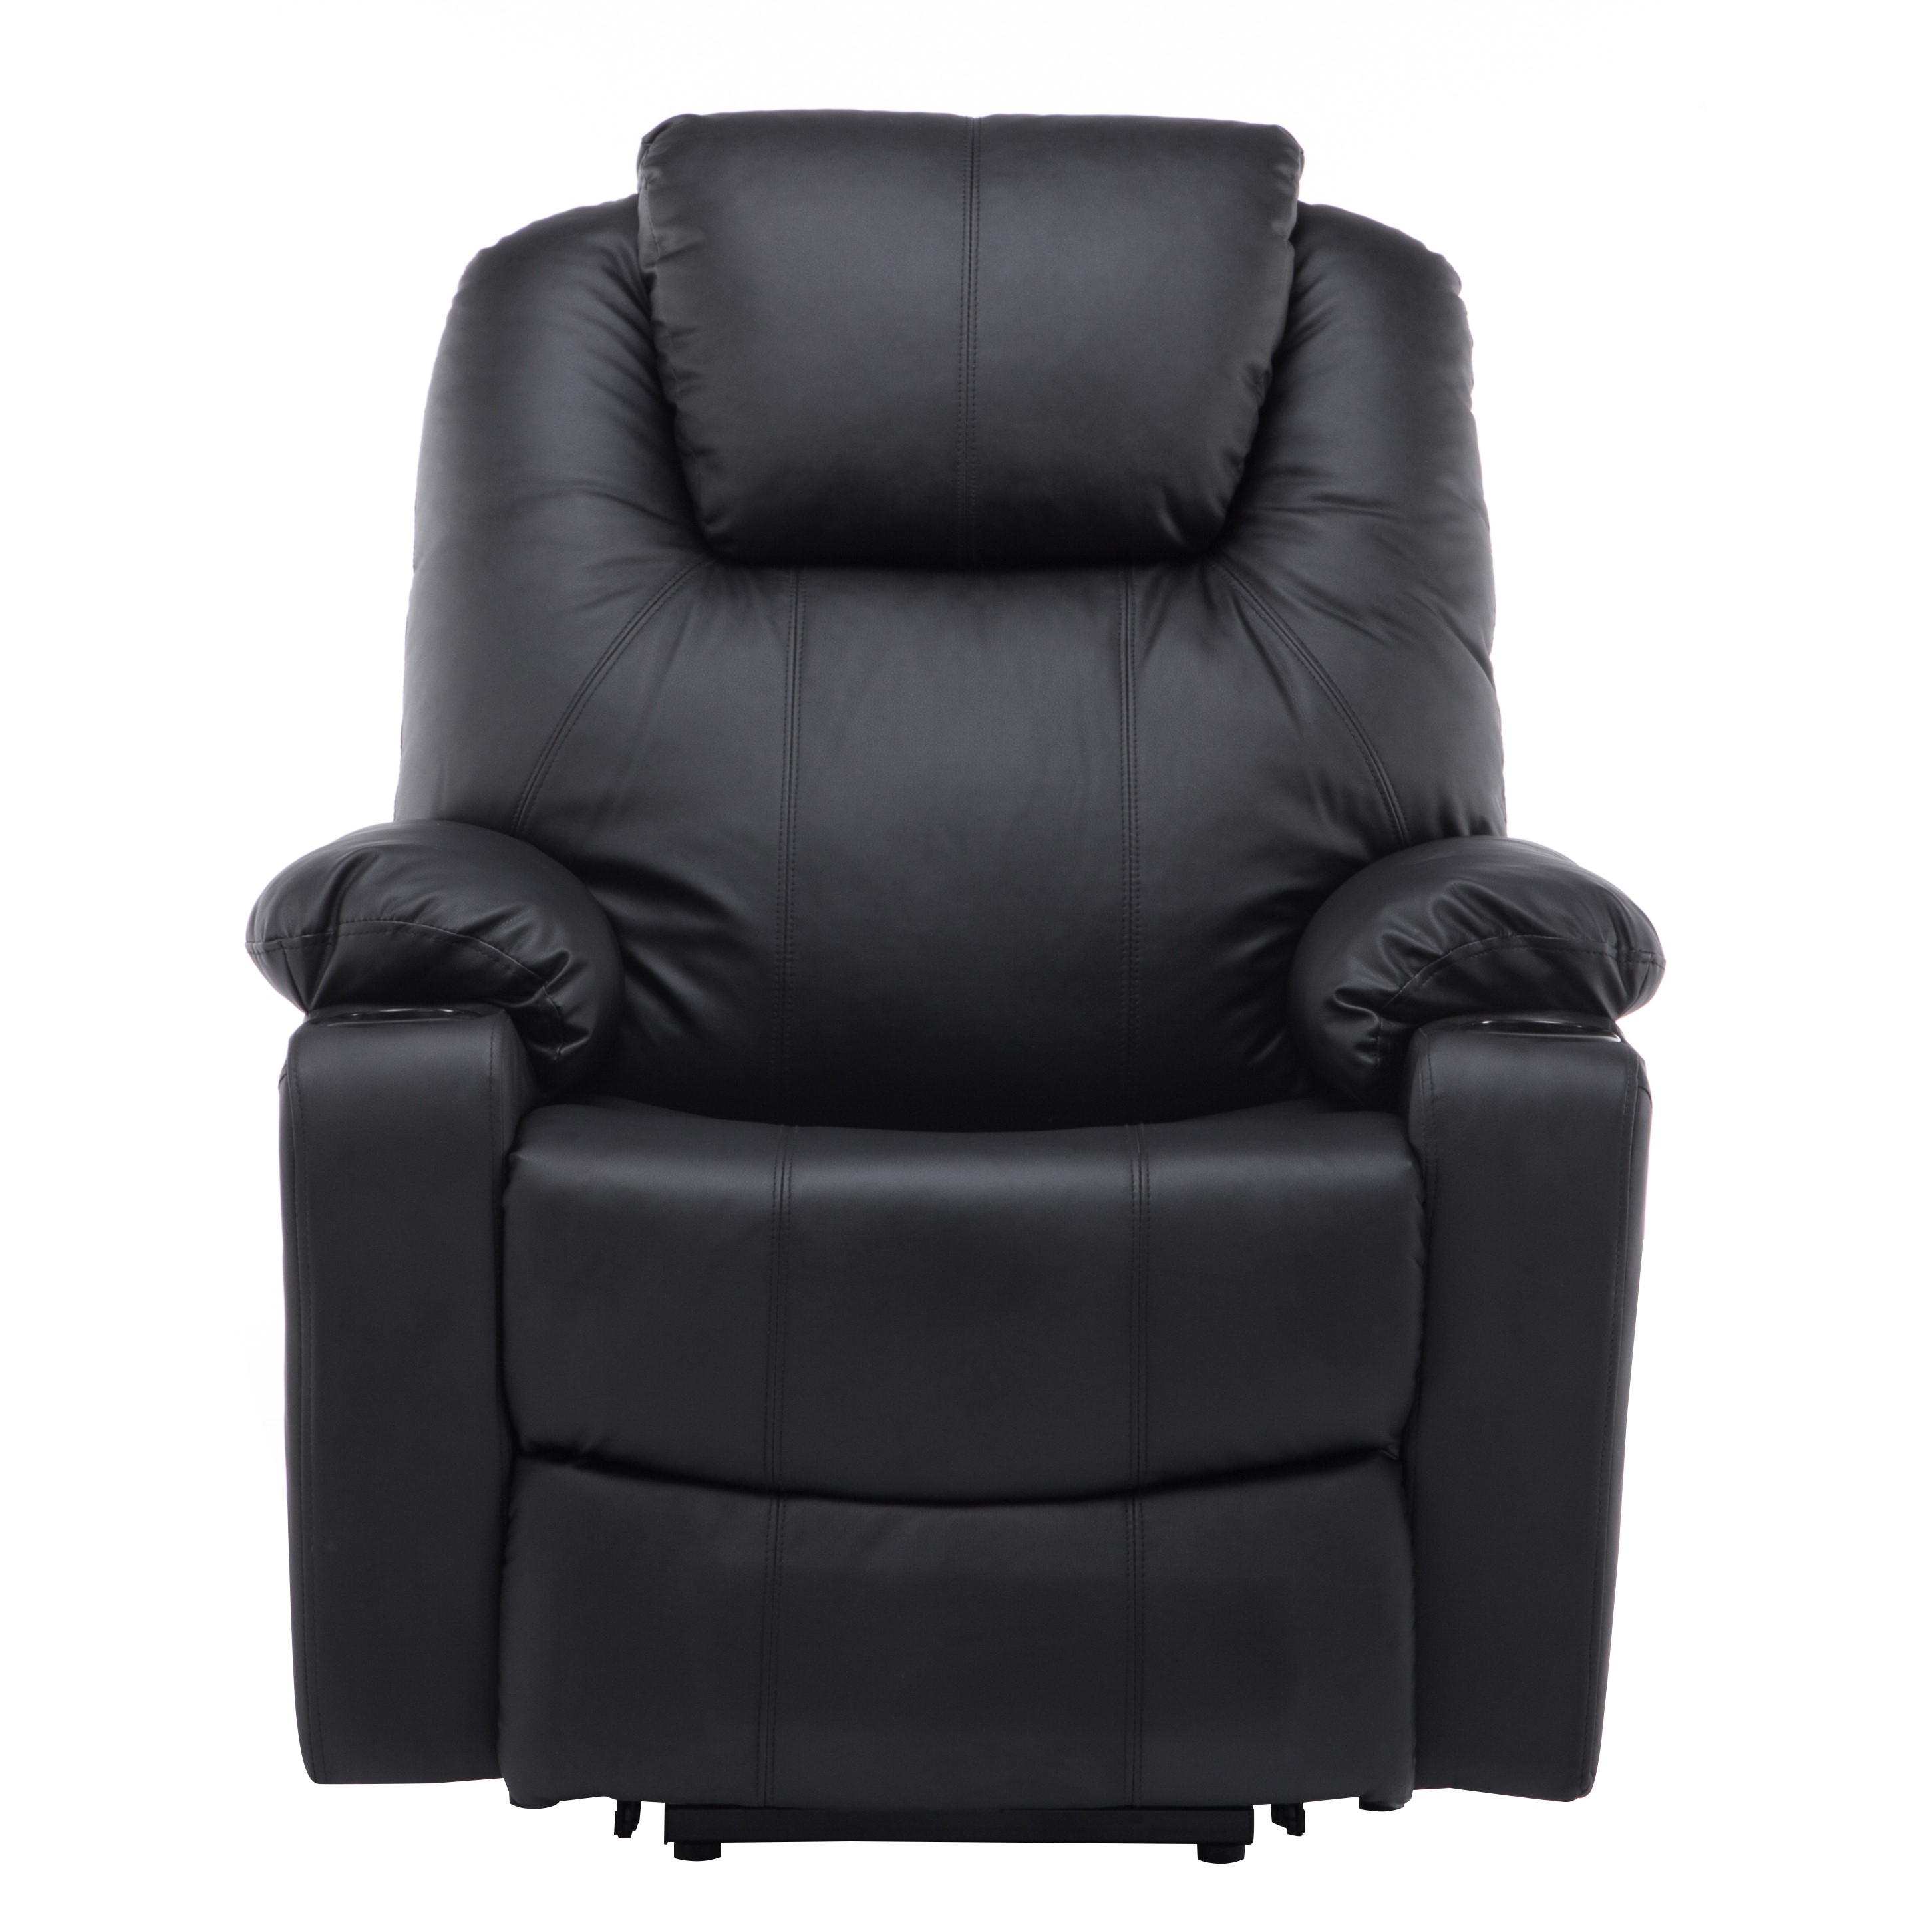 electric power lift massage sofa recliner heated chair lounge w rh walmart com